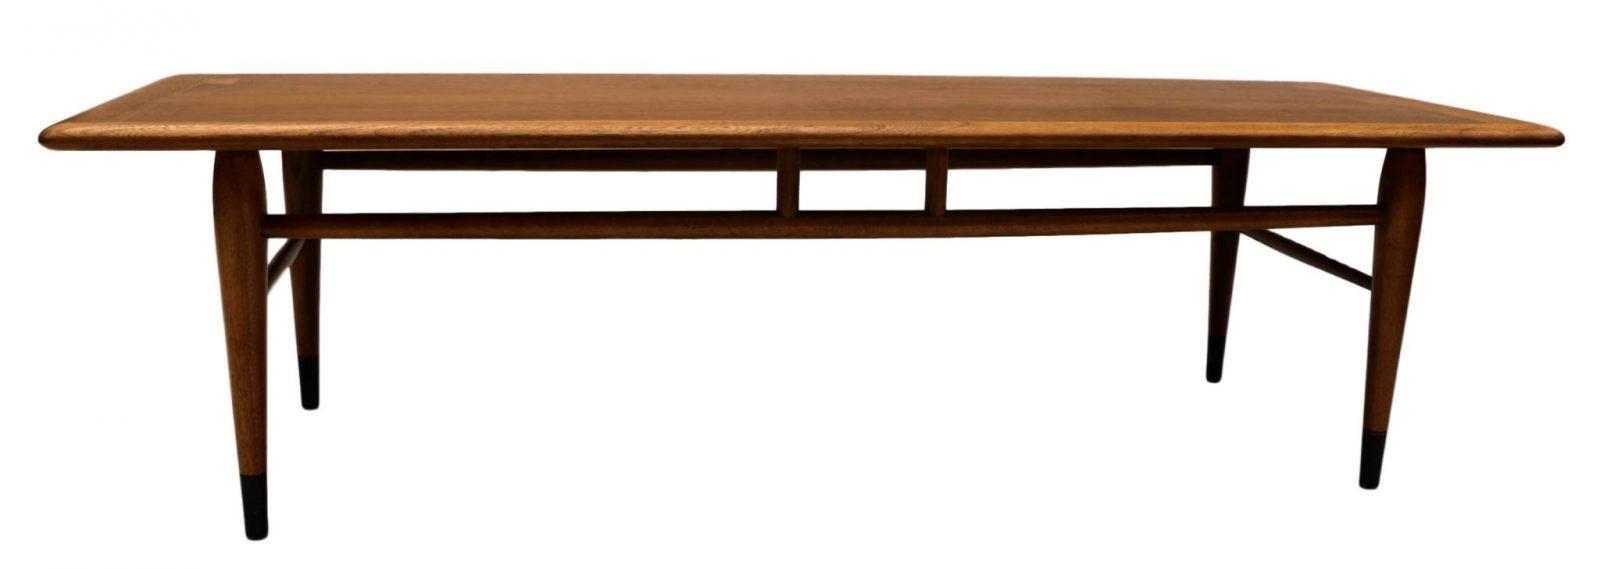 Mid Century Modern Dining Room Table Inlaid Walnut